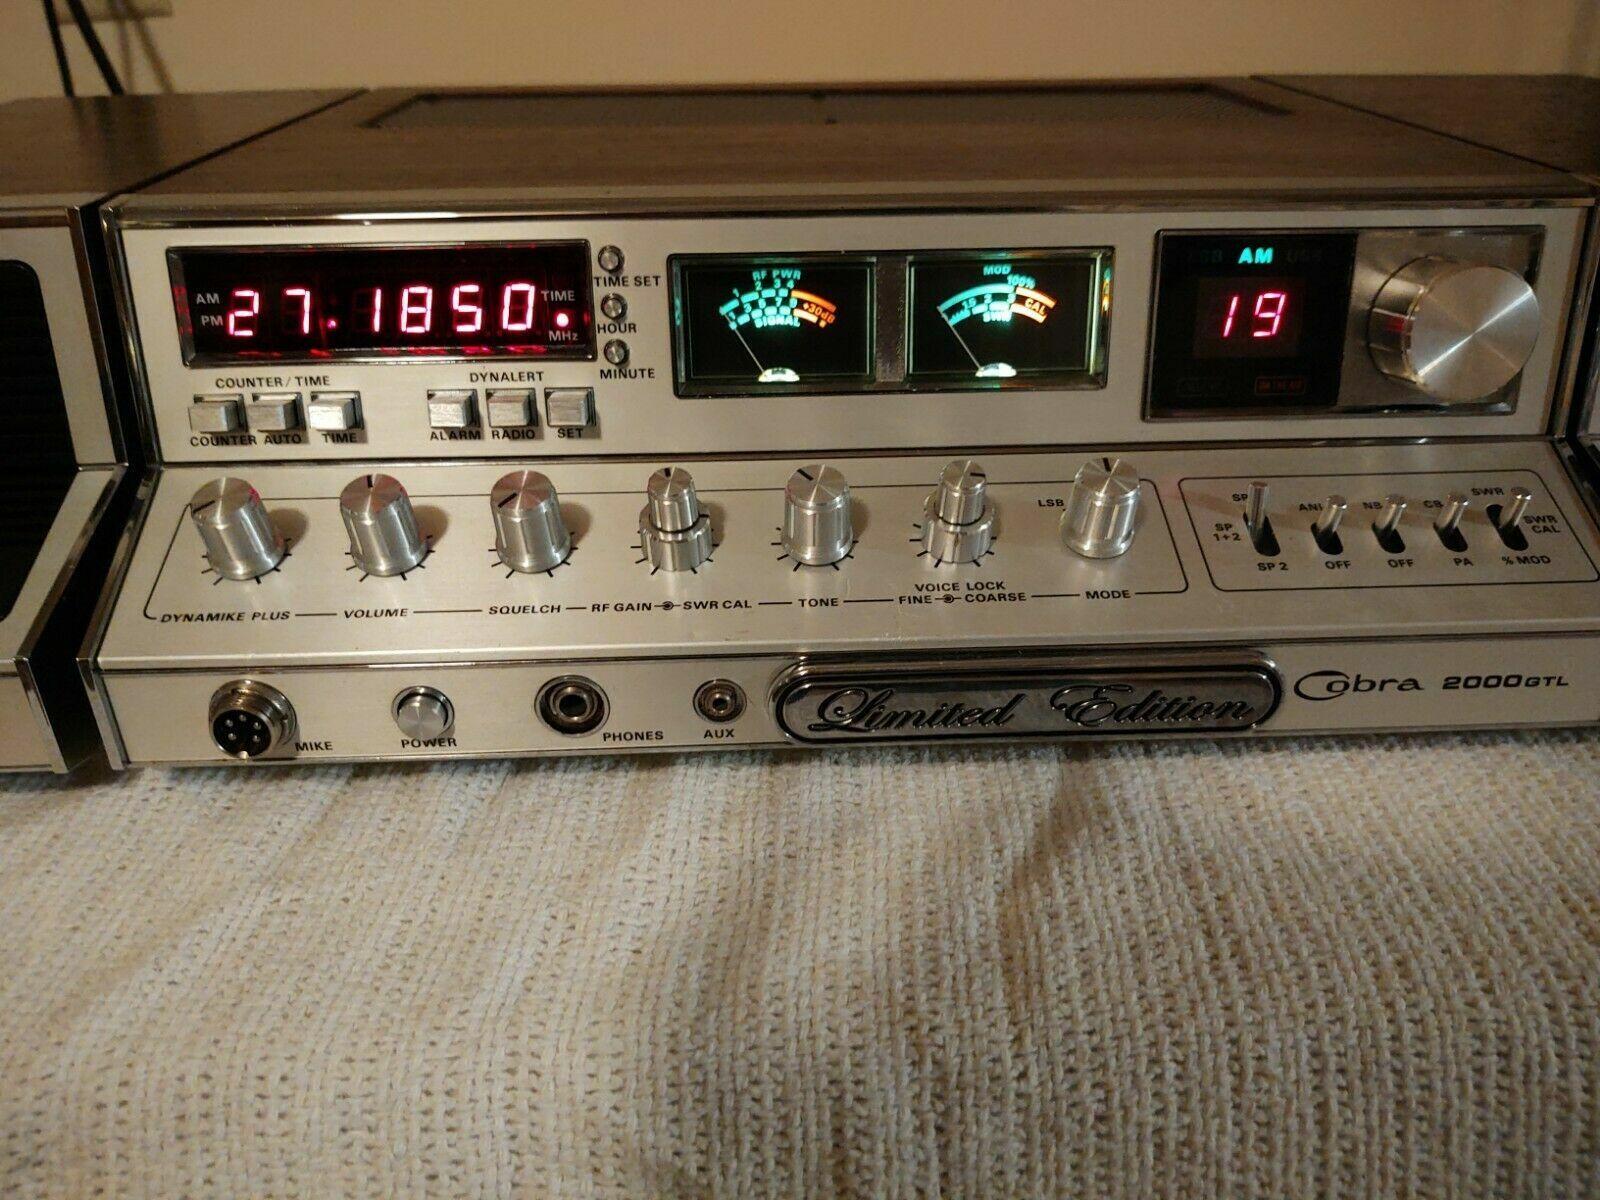 CB RADIO Cobra 2000 GTL-LE- CB BASE STATION AM/SSB/Up/Low/Channels Dial a Watt. Buy it now for 899.00